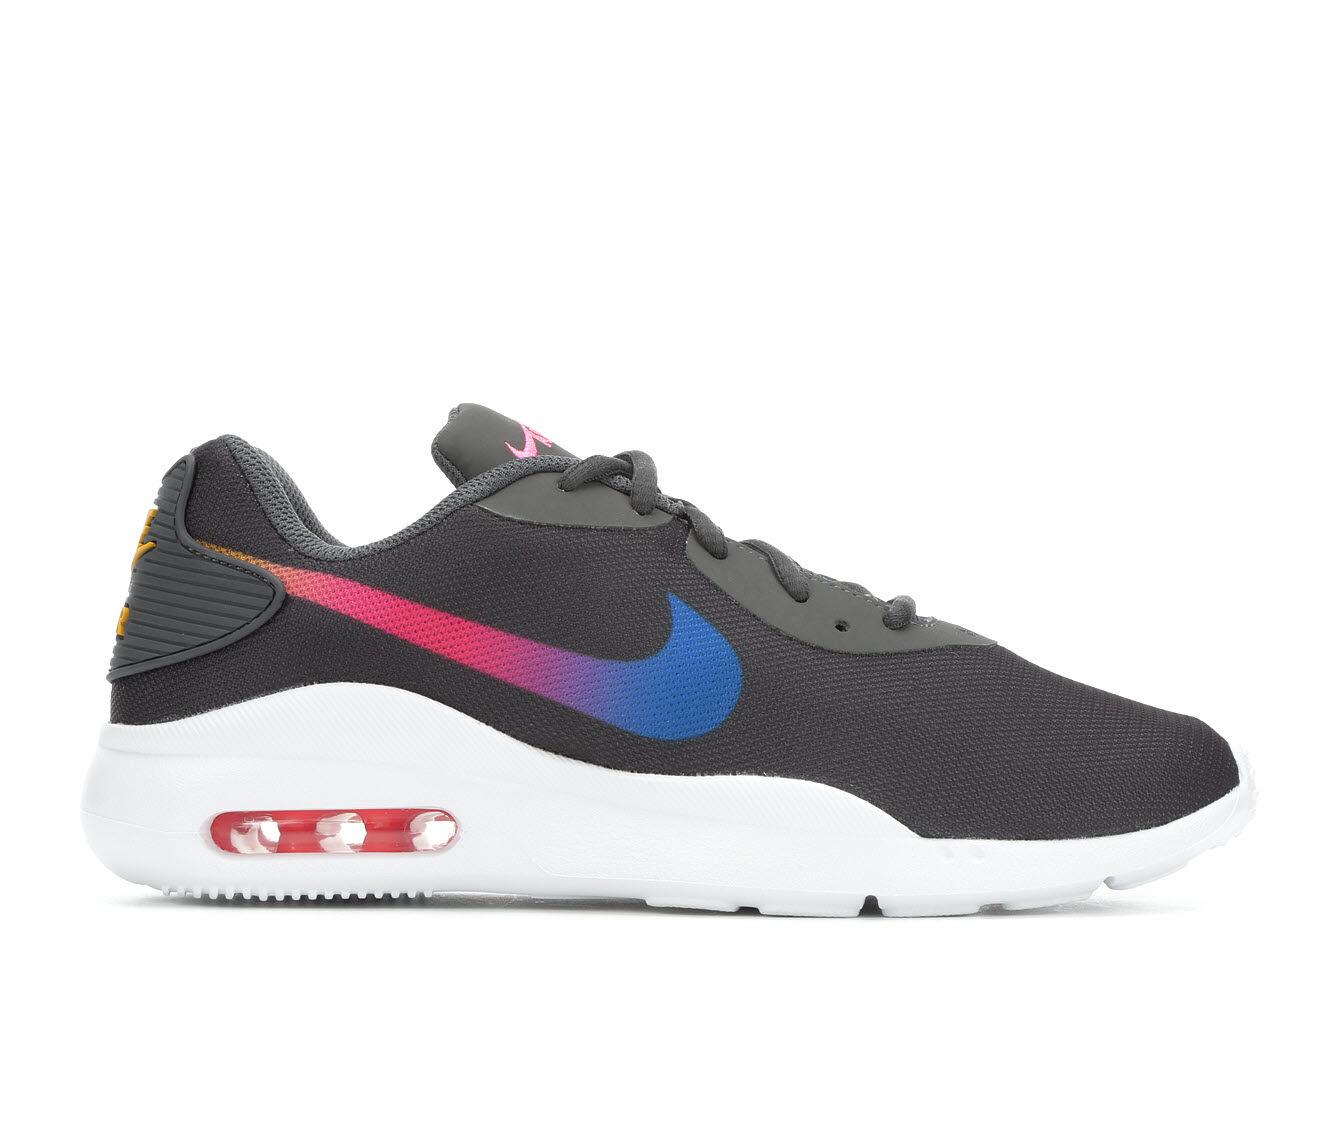 Women's Sneakers | Women's Athletic & Tennis Shoes